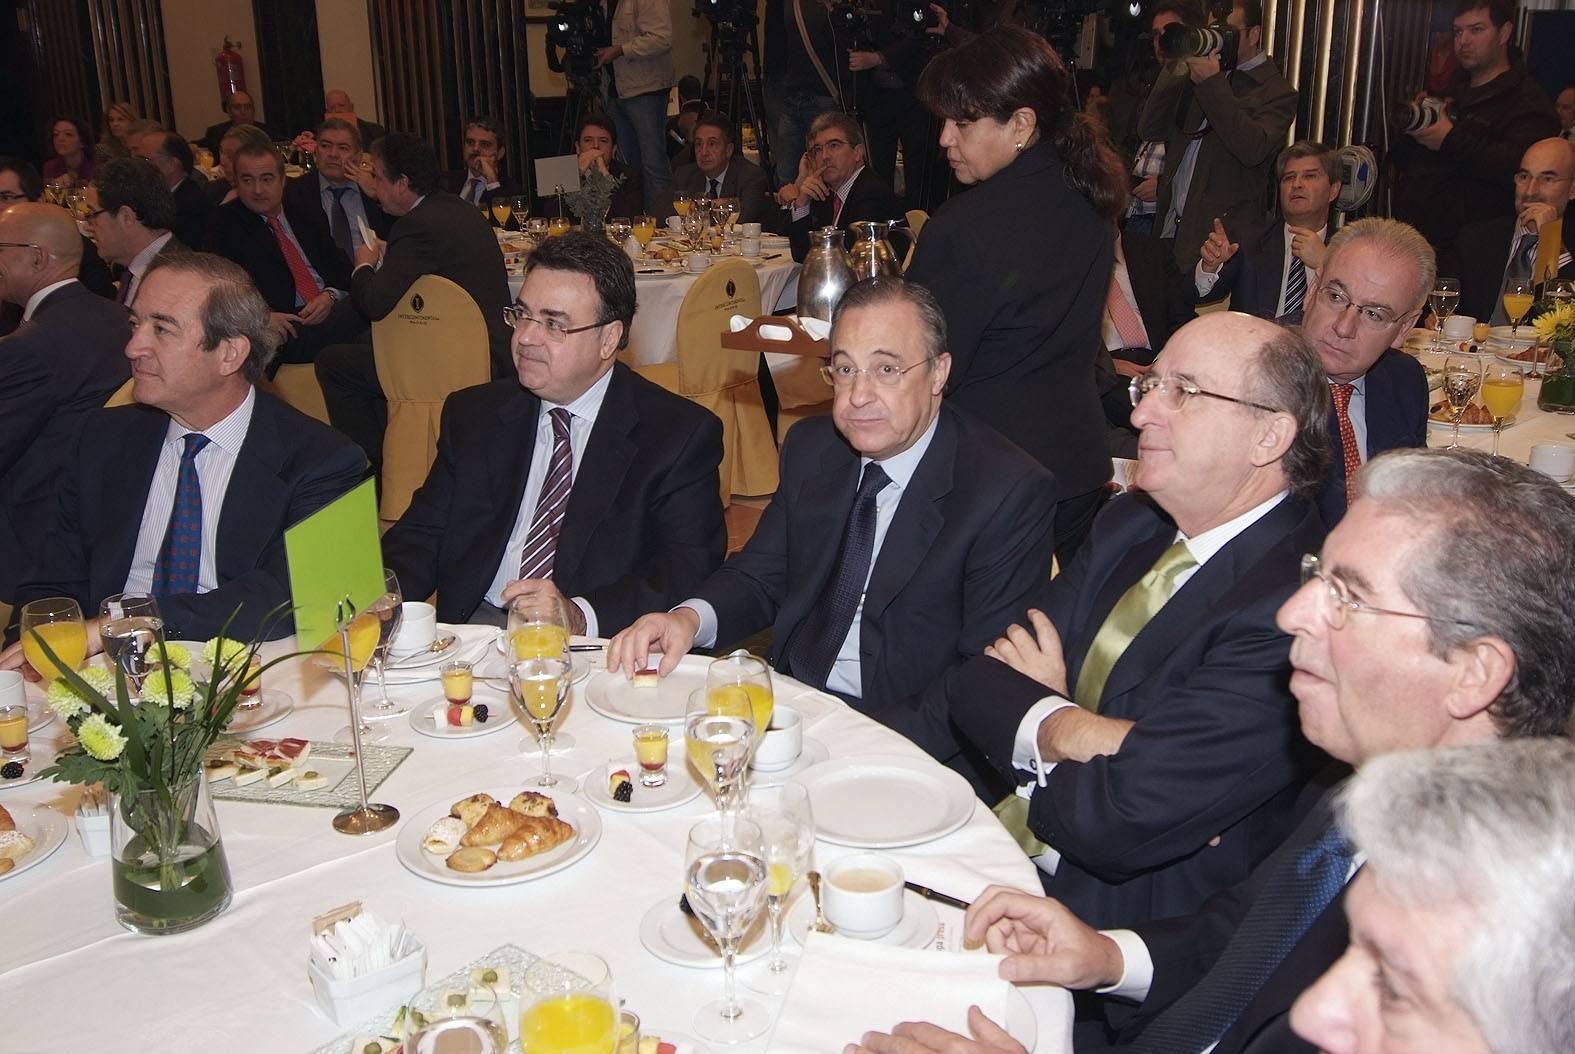 El_president_d'ACS,_Florentino_Pérez,_escolta_Artur_Mas_a_l'esmorzar_col·loqui_d'Europa_Press_a_Madrid